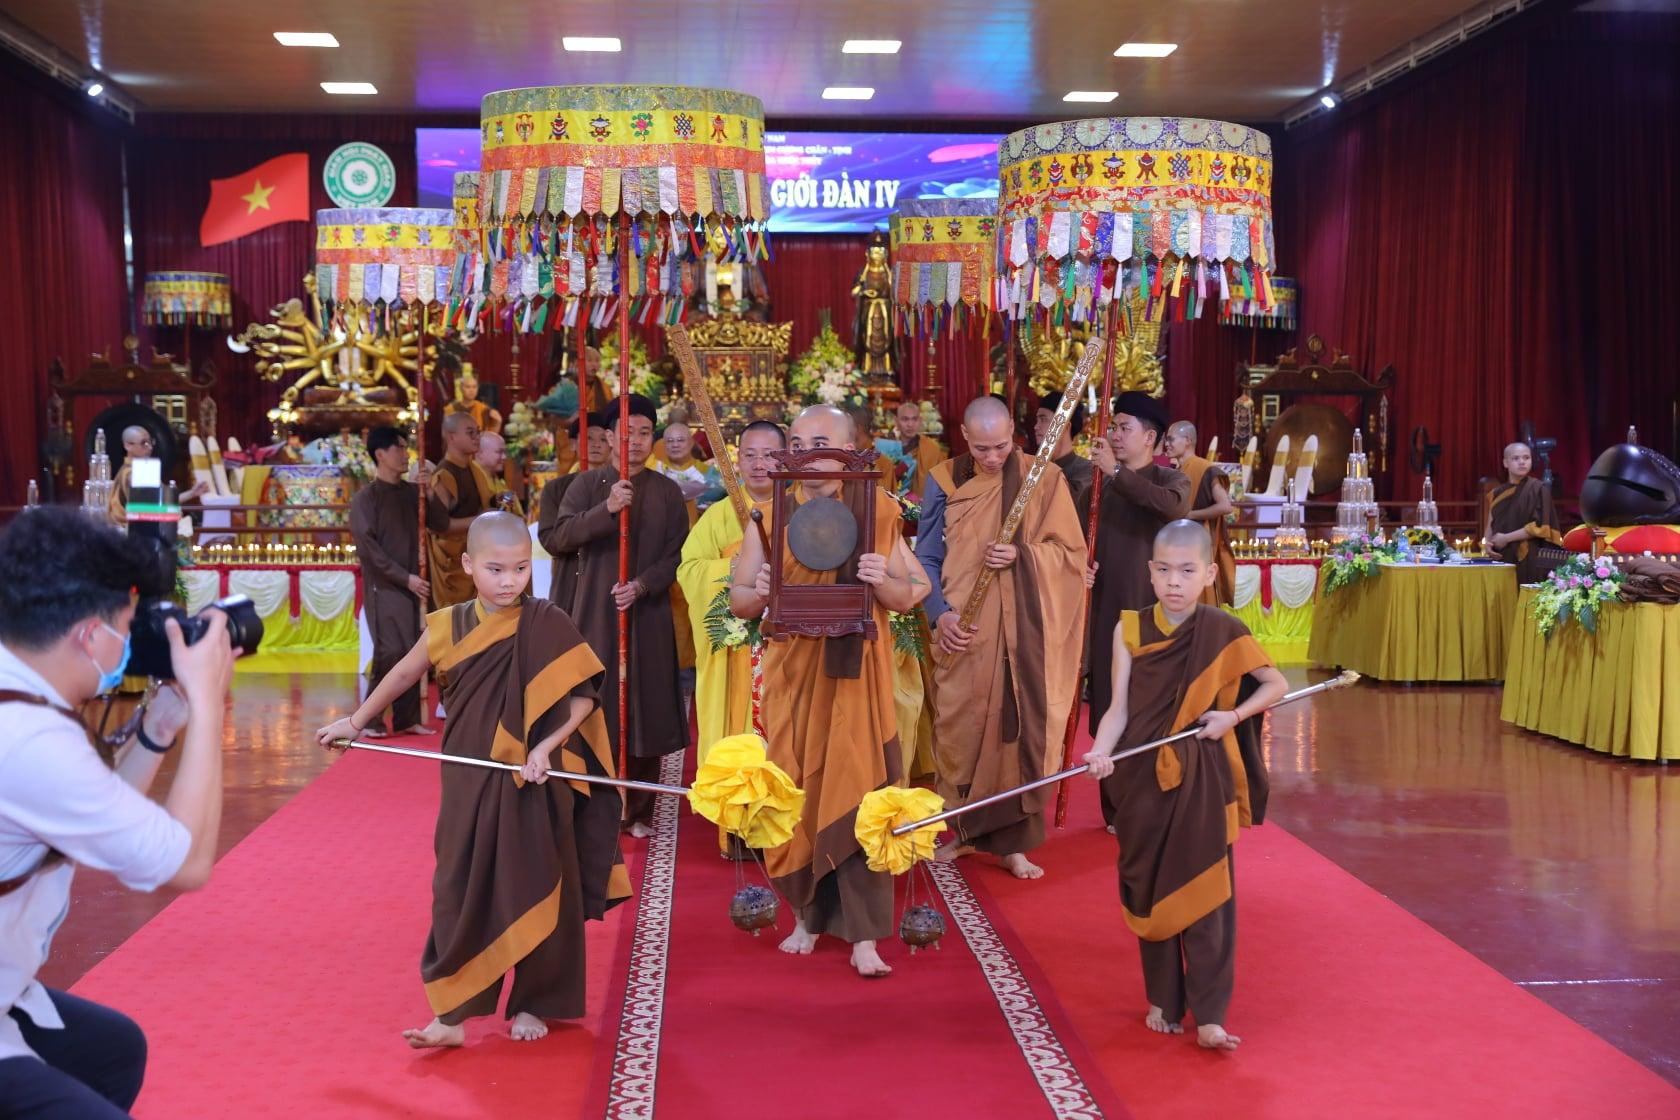 Thang Nghiem Dai Gioi Dan IV (30)